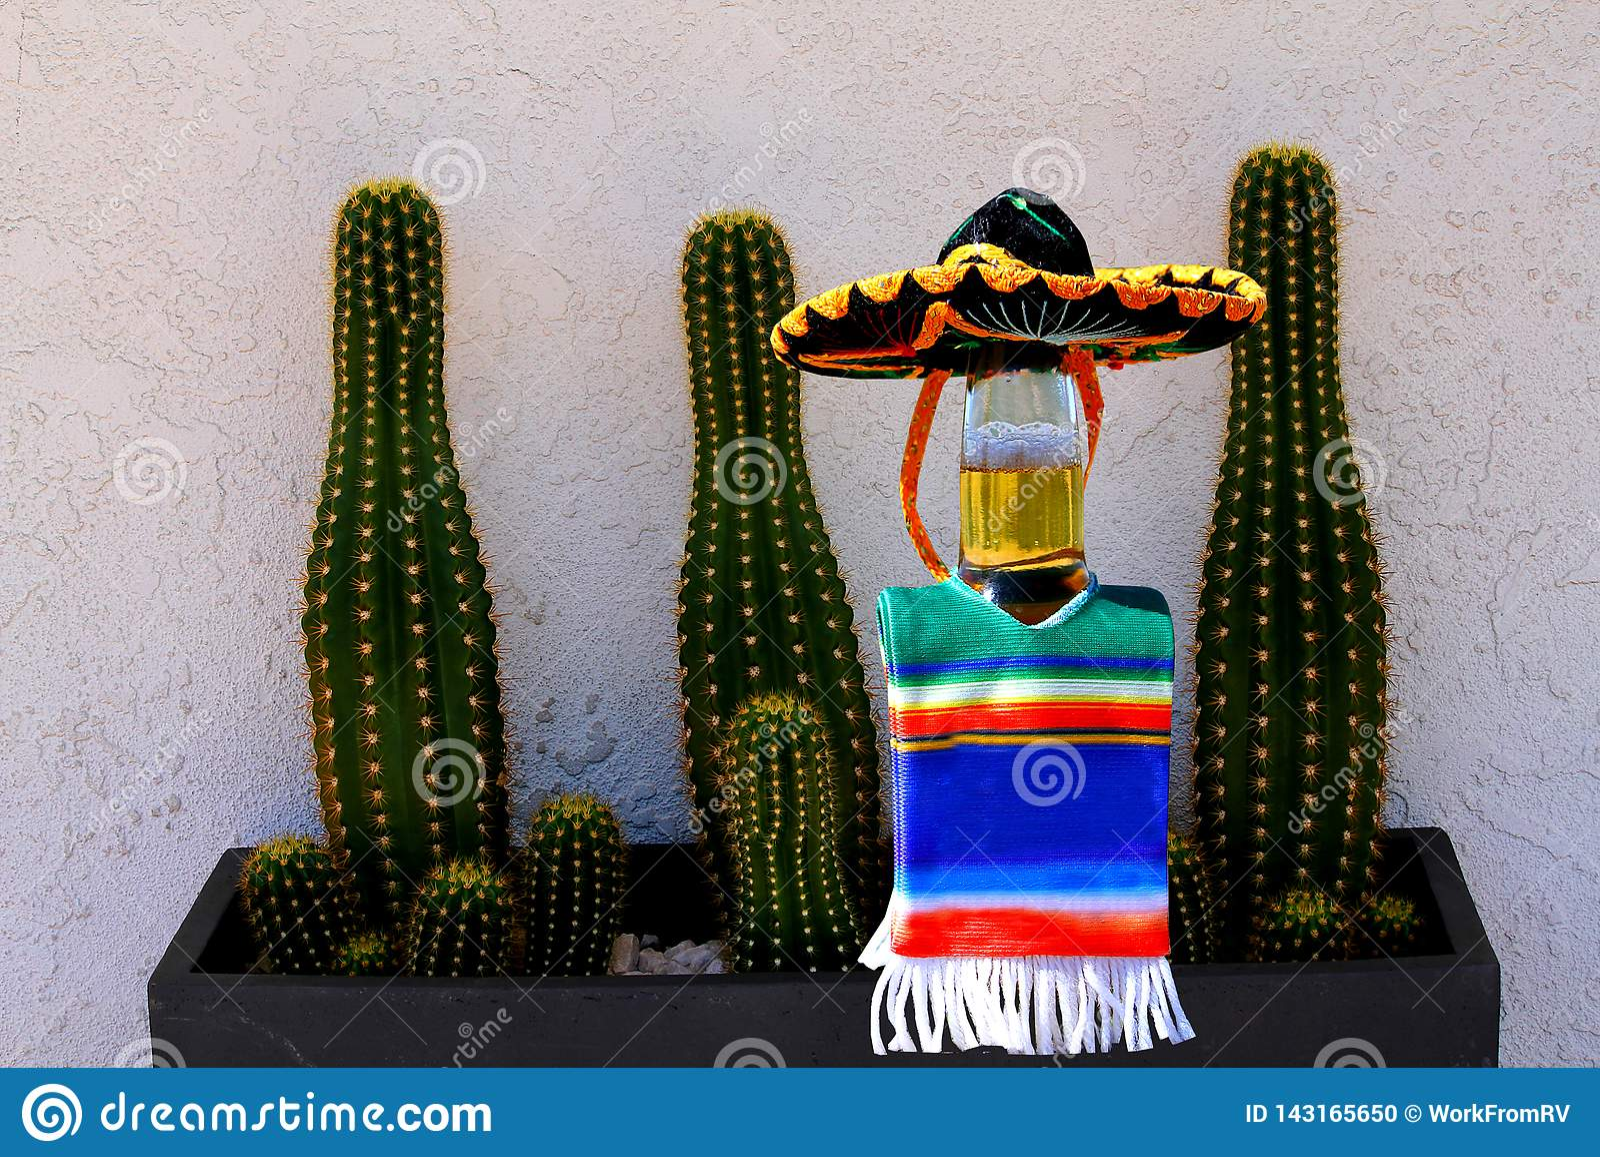 Cinco de Mayo beer bottle and cactus.